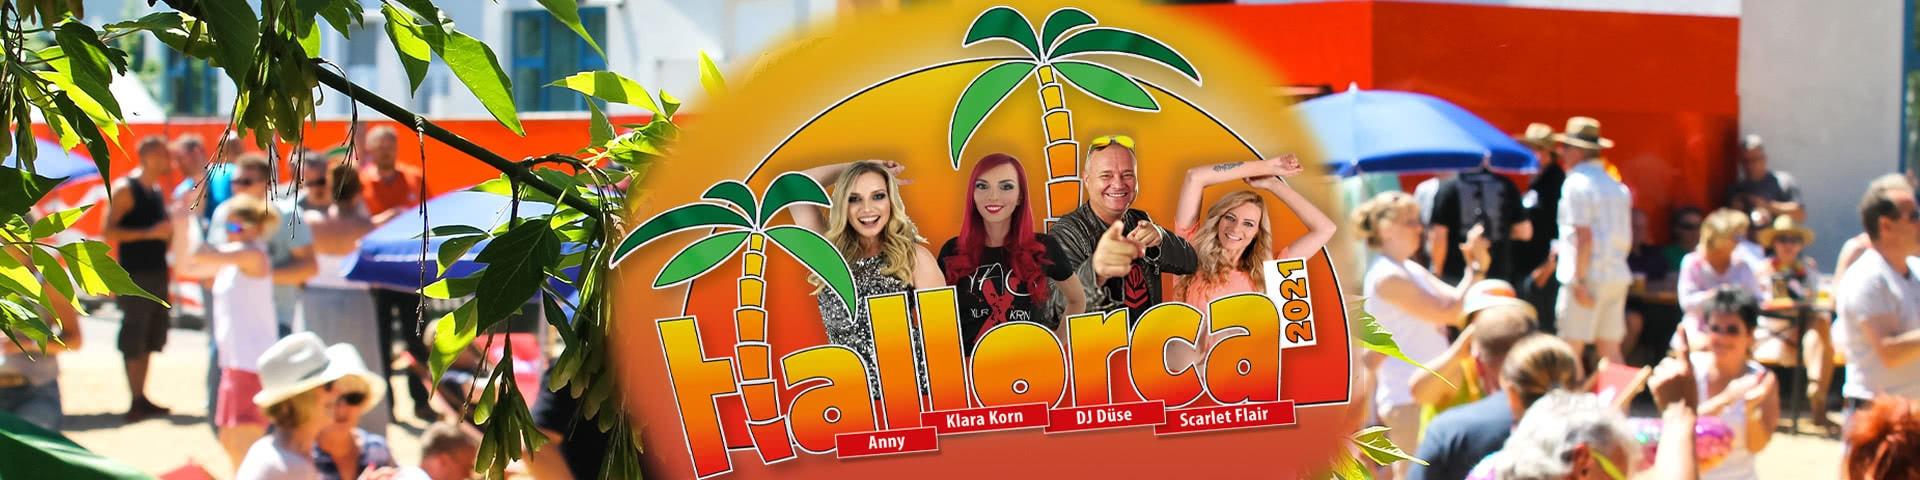 Halorca Beachparty mit Künstlern